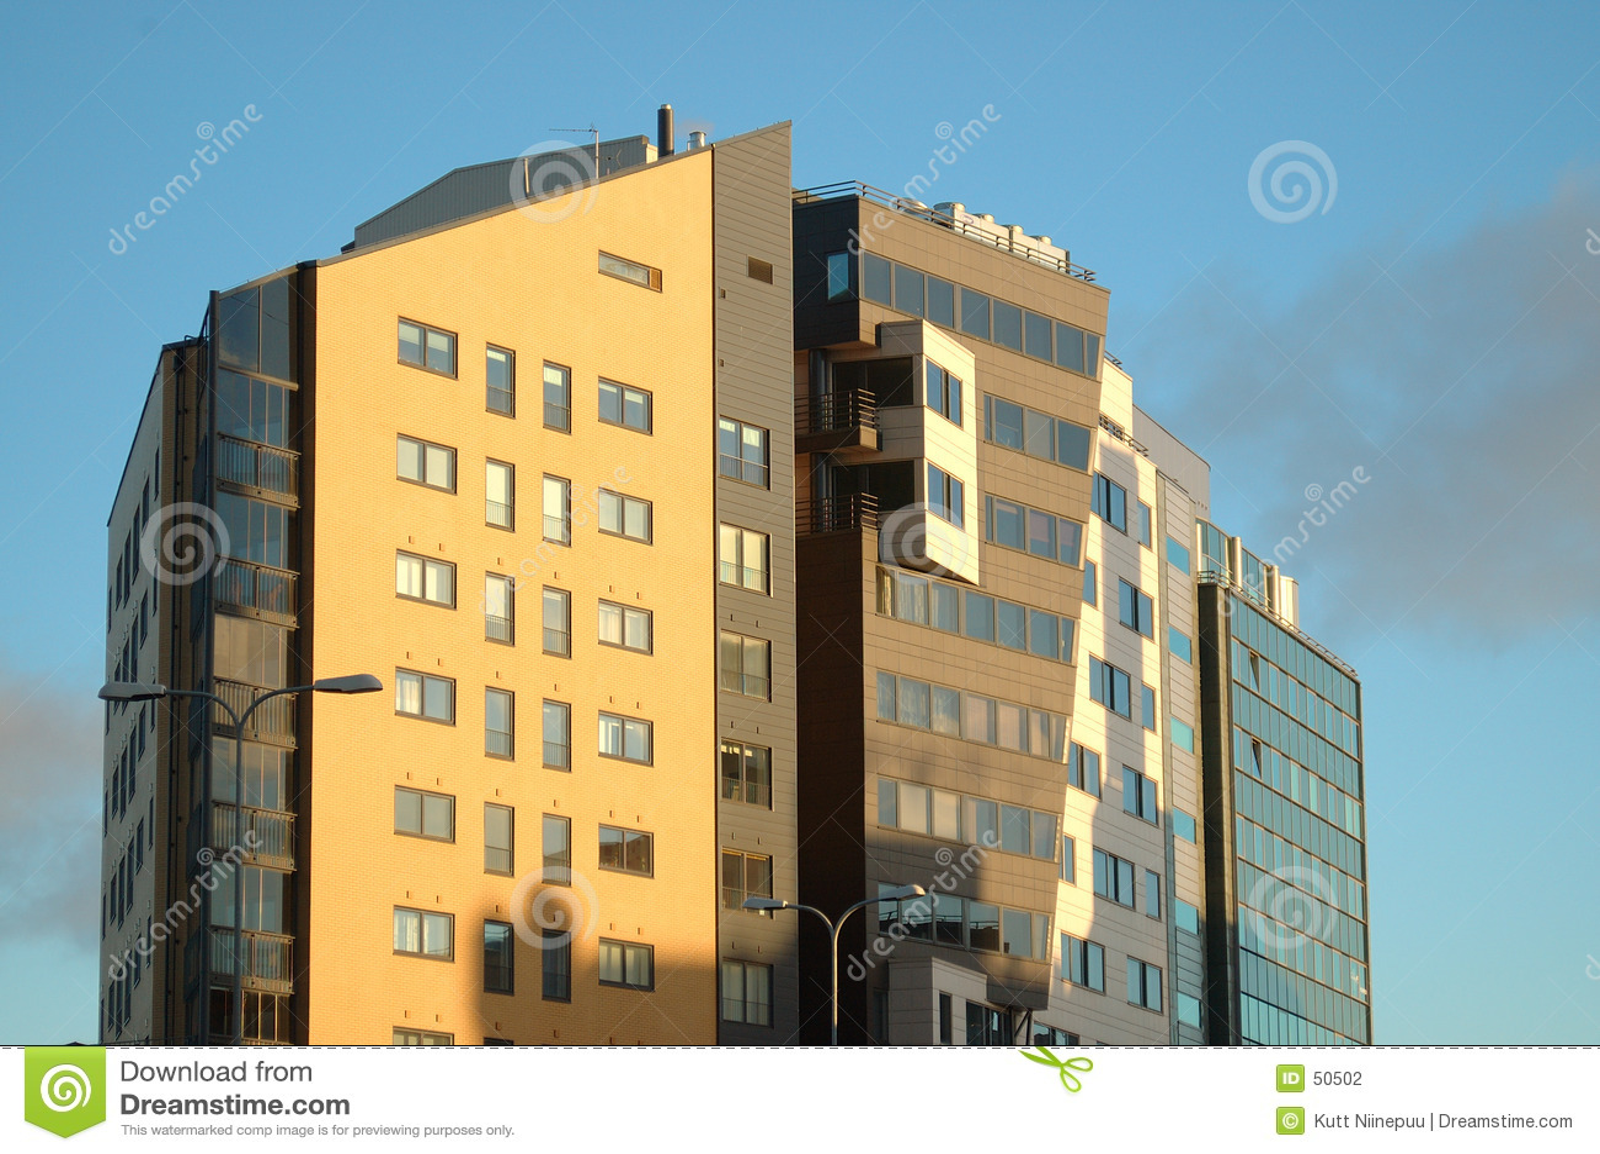 Maravilla arquitectónica